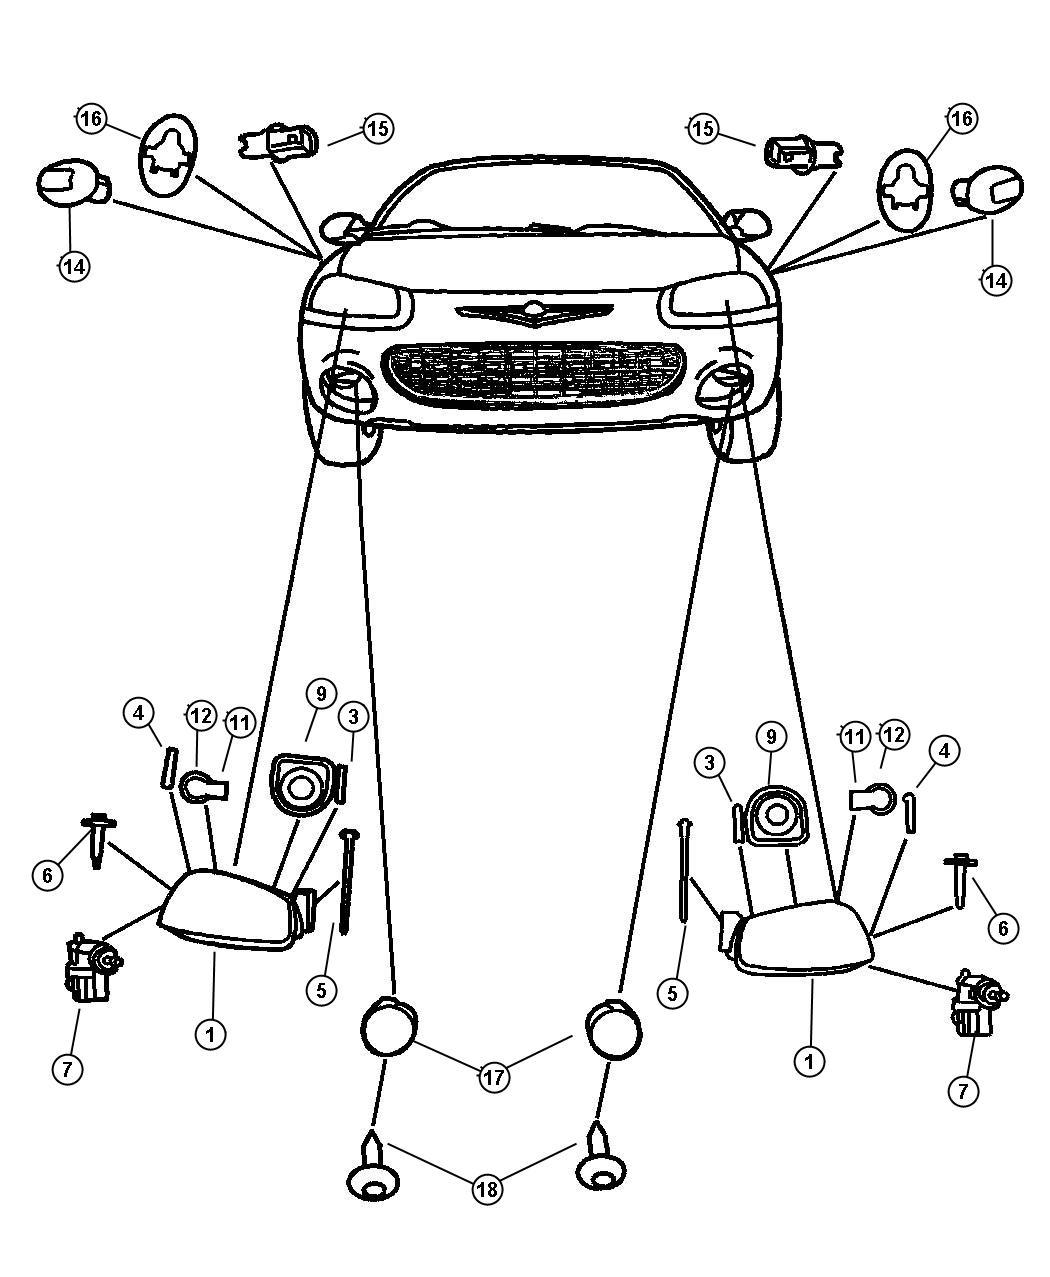 Dodge Stratus Wiring. Headlamp. Halogendaytime